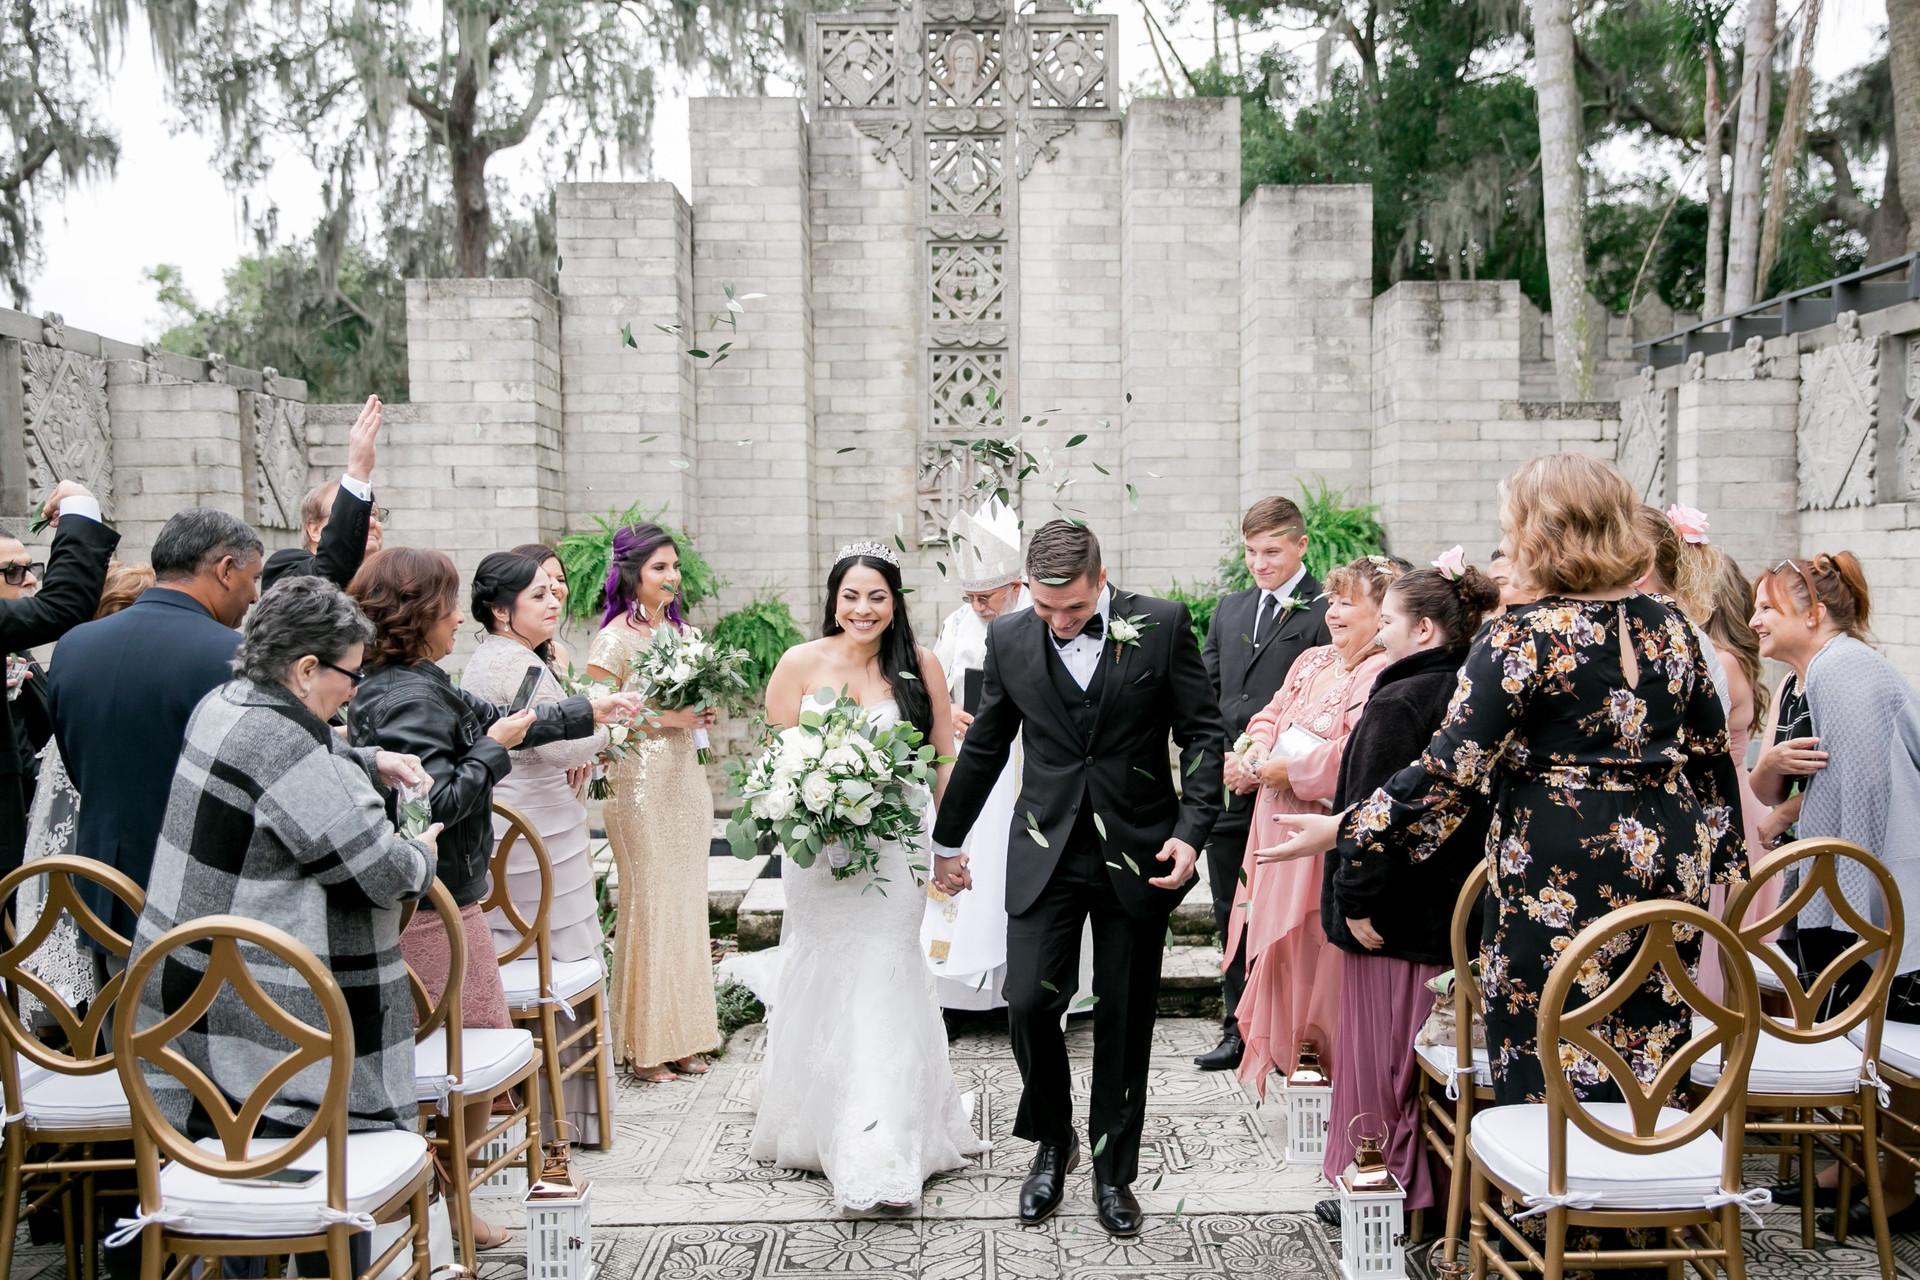 Le fleur atelier white and green wedding